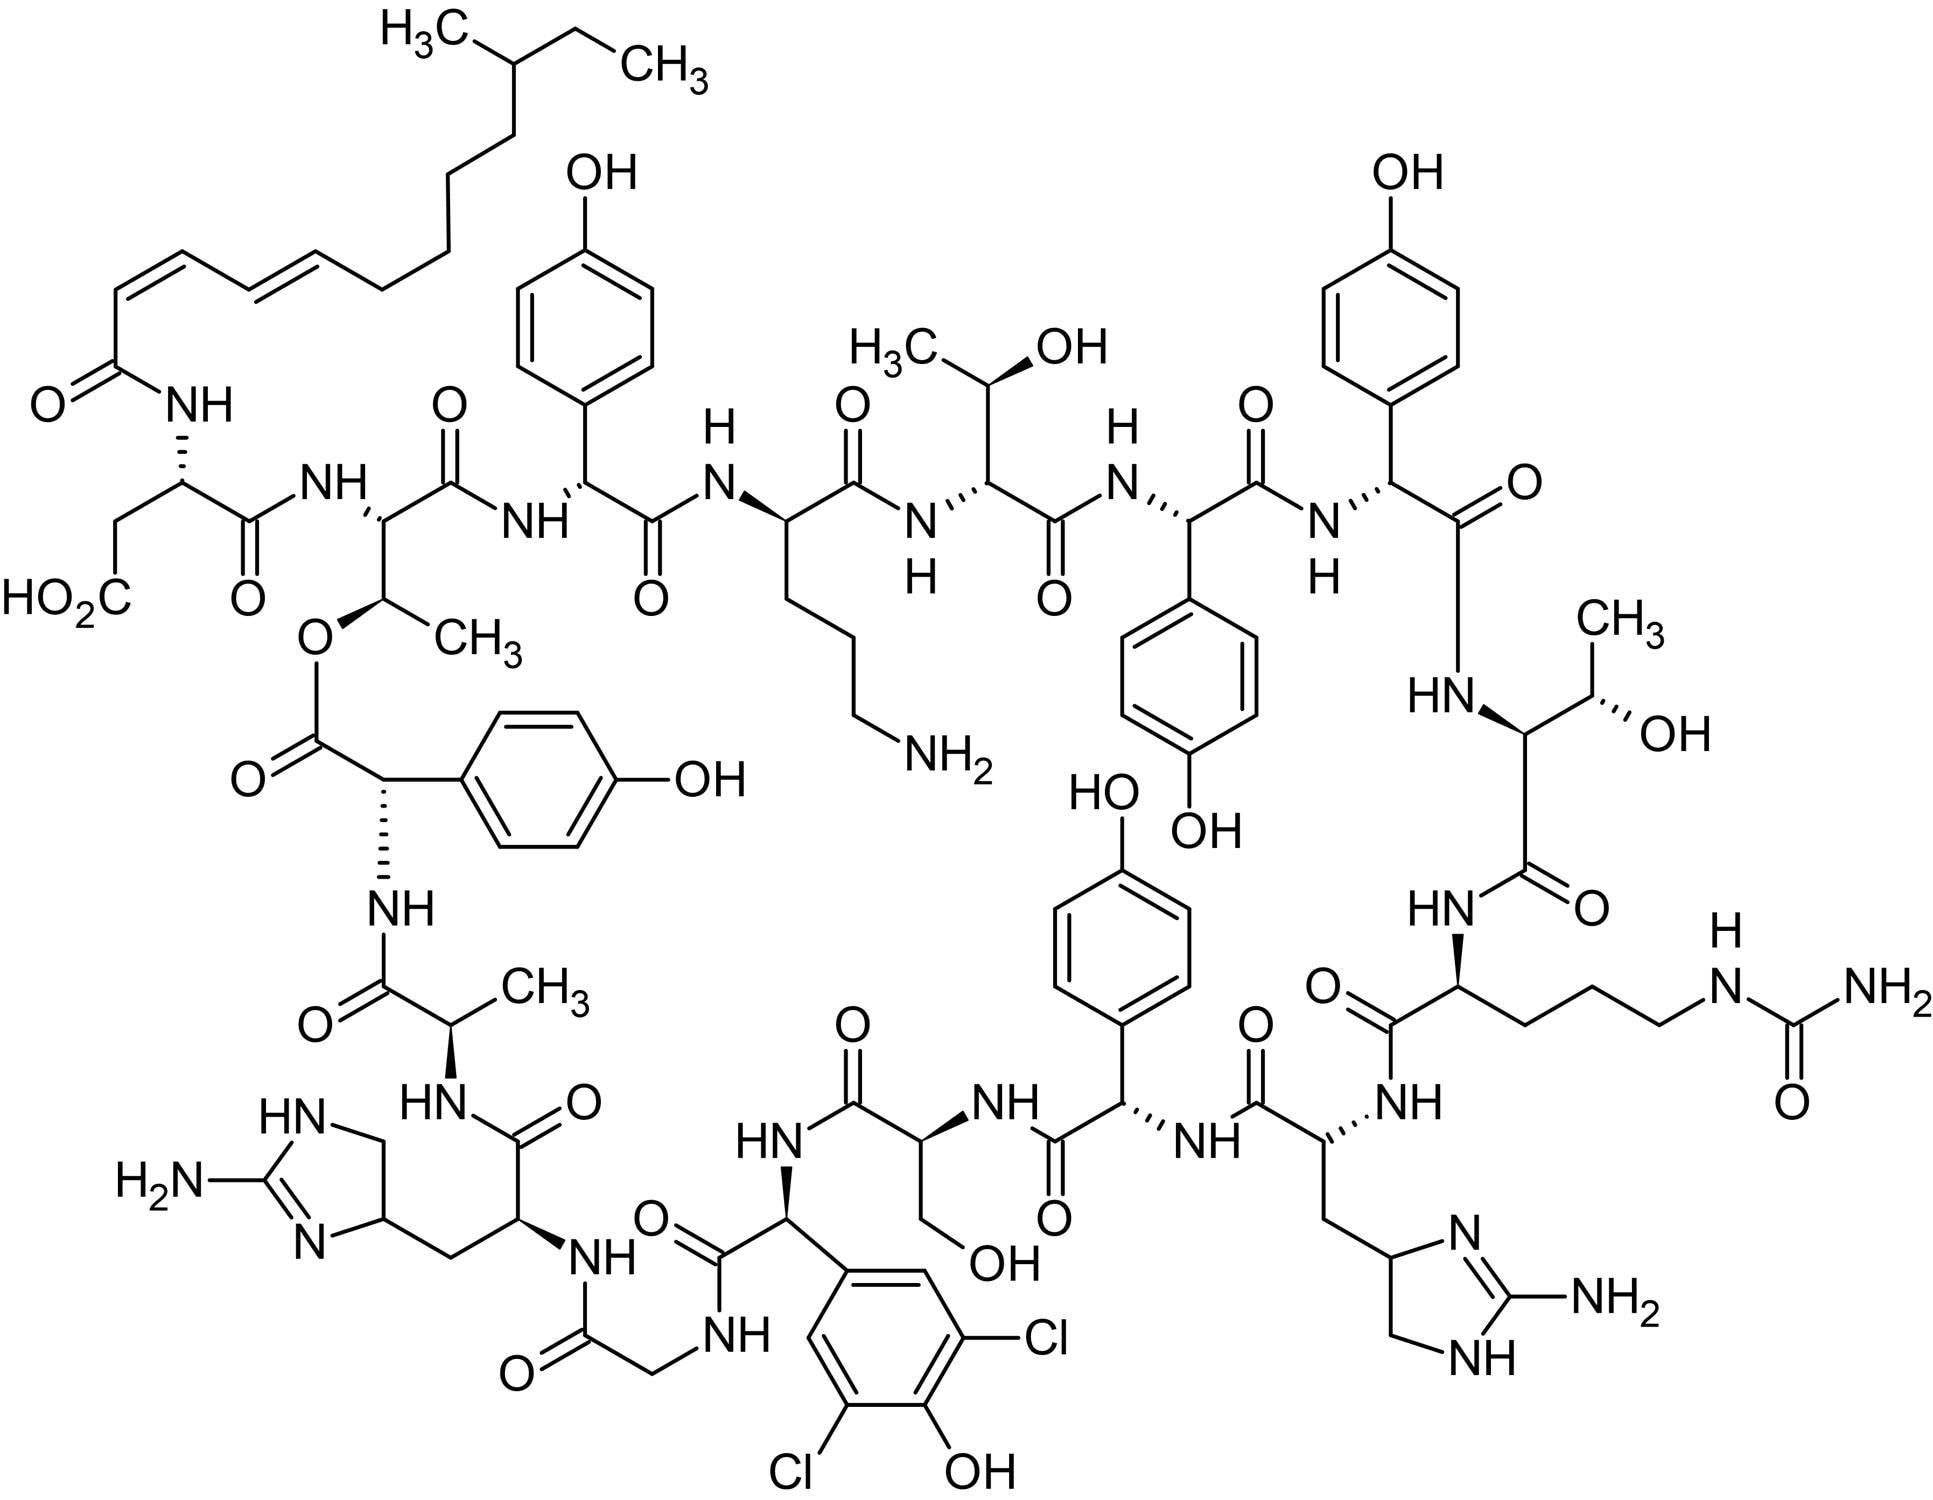 Chemical Structure - Enramycin B (Enduracidin B), Lipodepsipeptide antibiotic agent (ab143613)